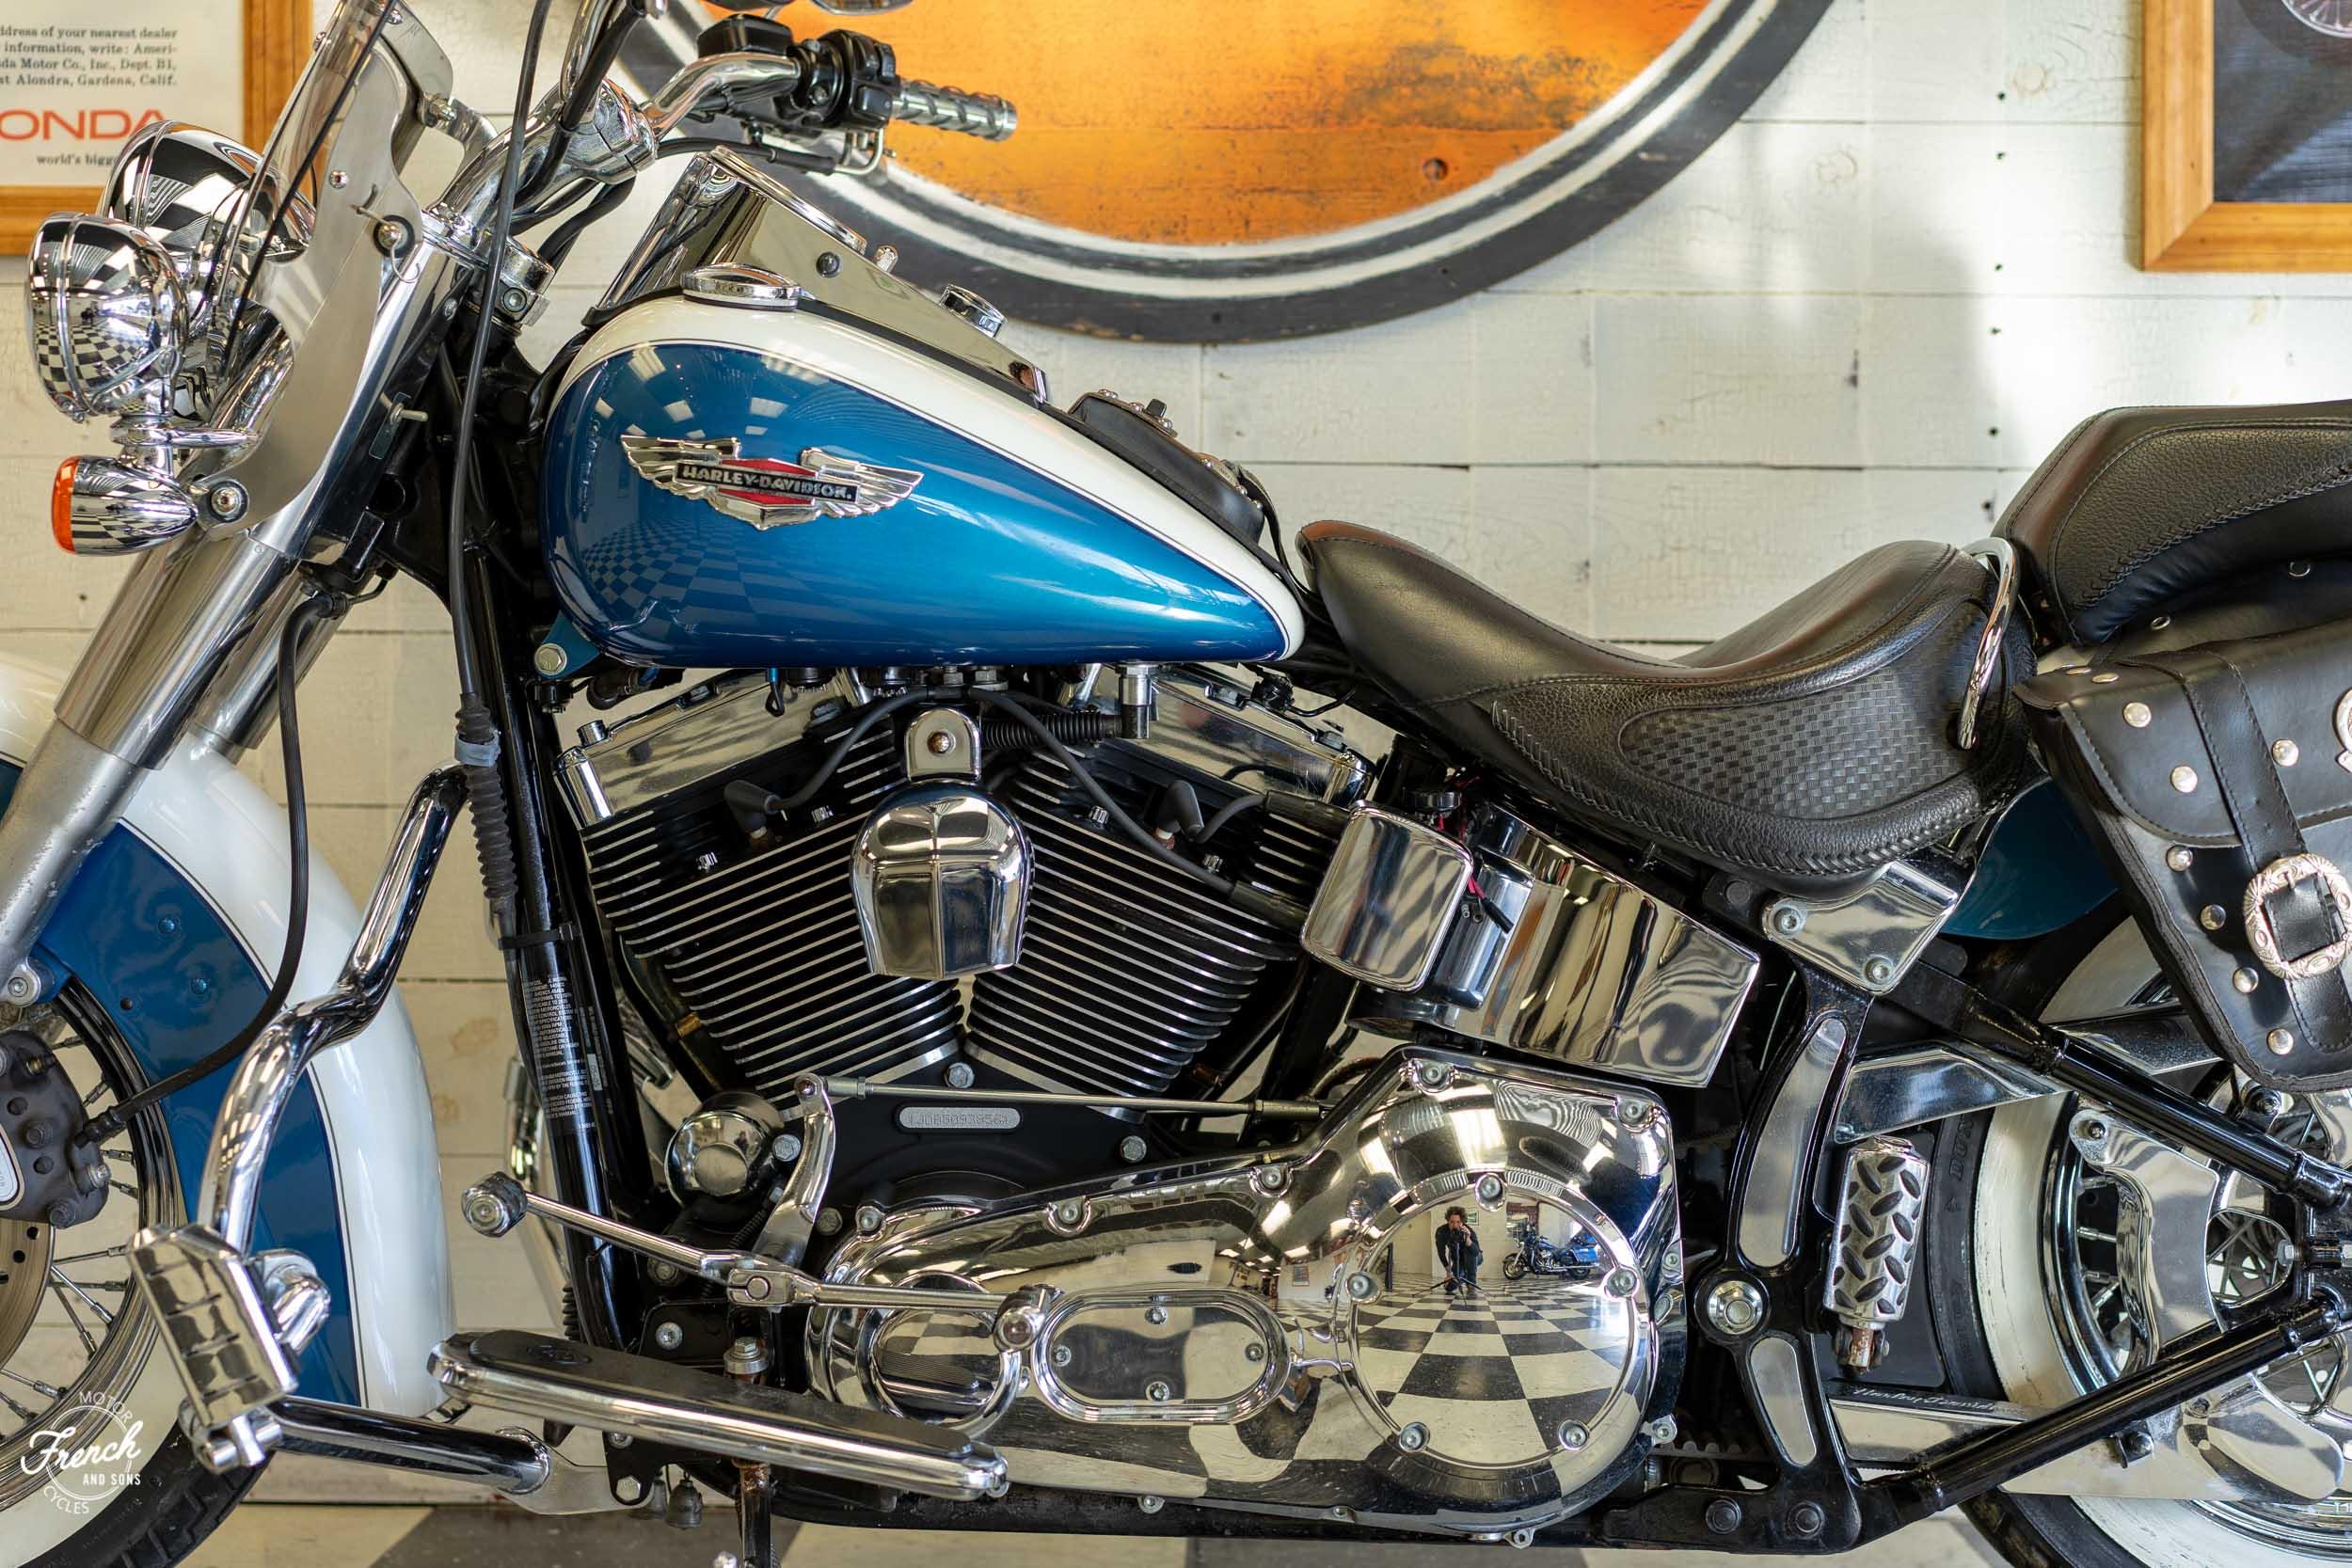 2005_Harley_Davidson_Softail_Deluxe-17.jpg